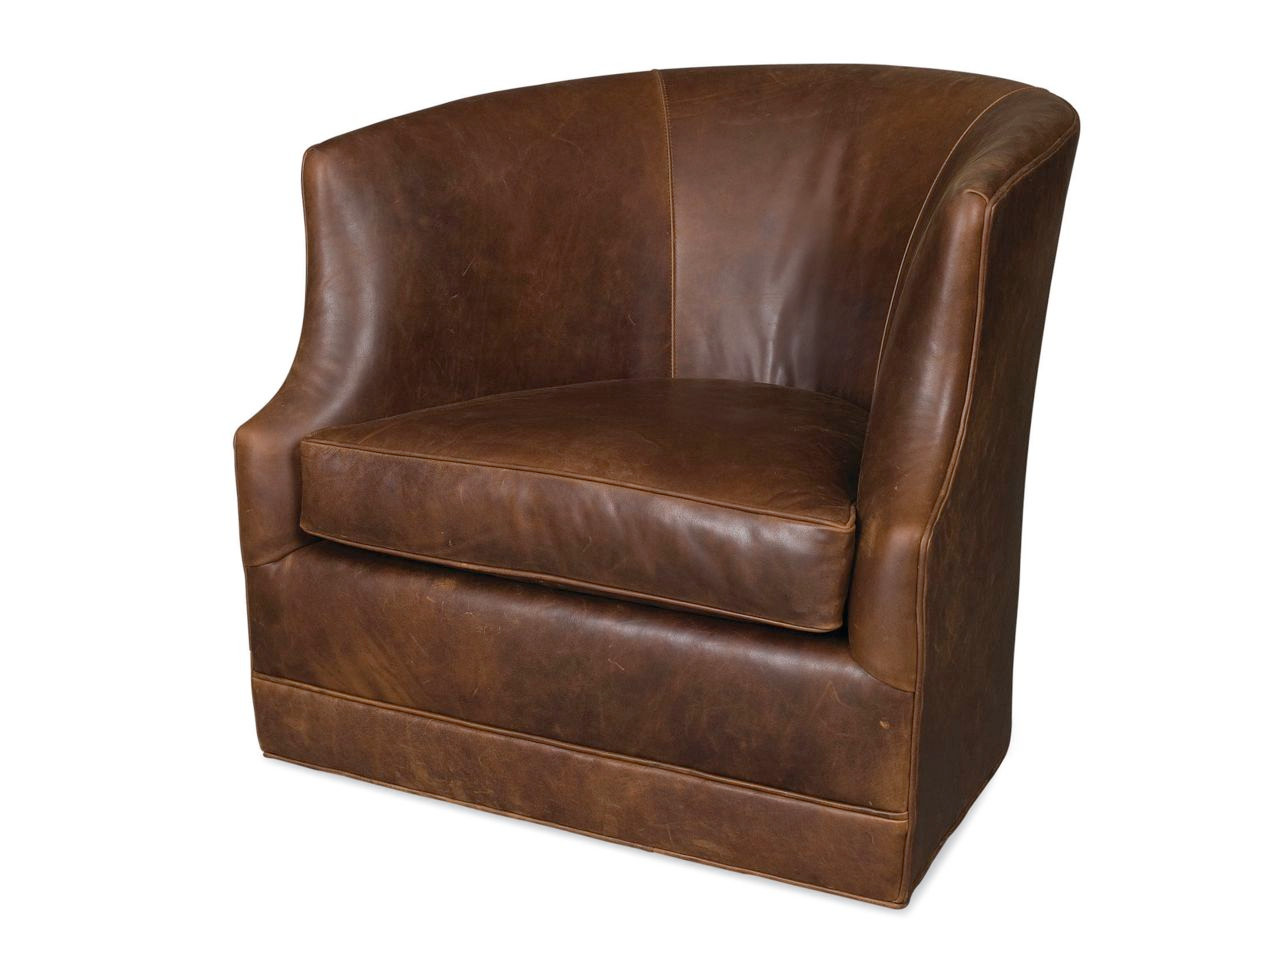 Lara Leather Swivel Chair Leather Swivel Chairs Swivel